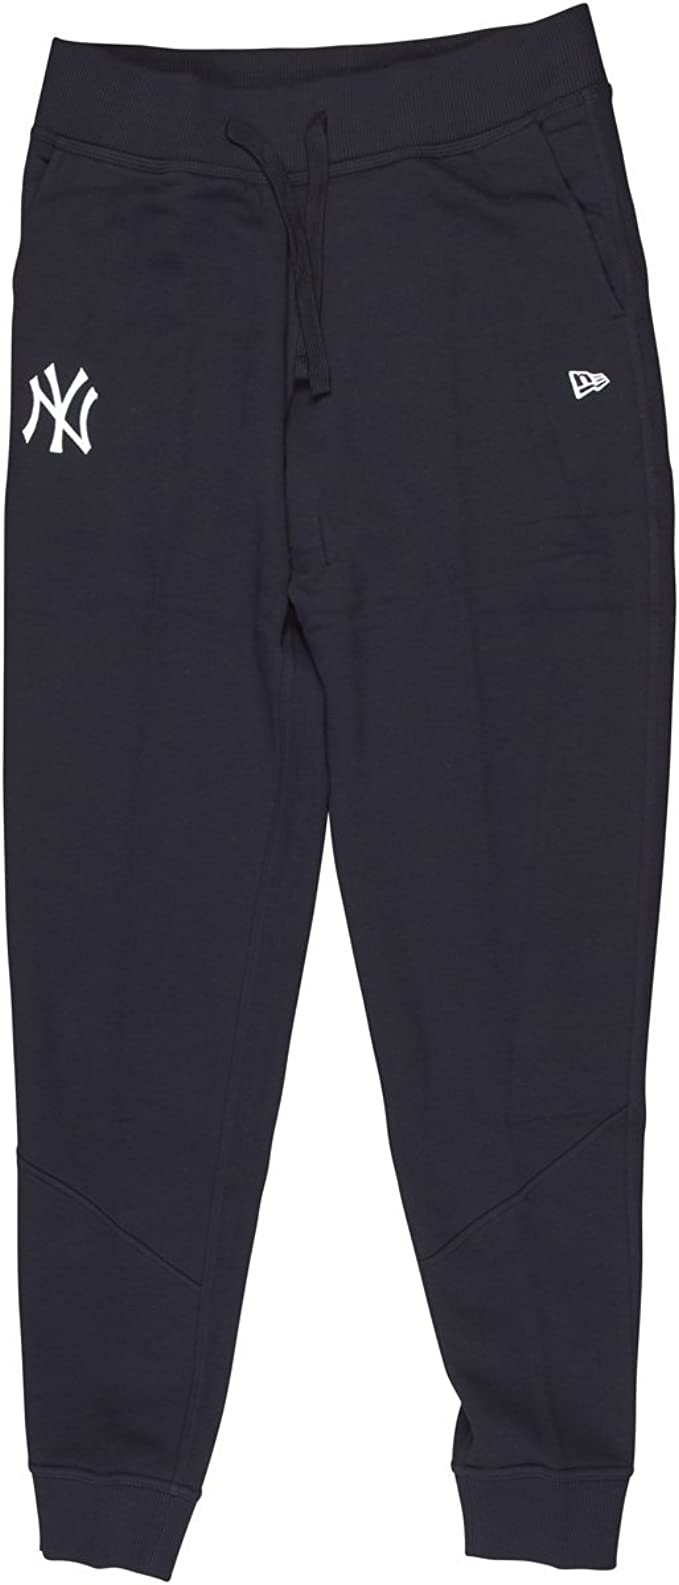 New Era Mlb New York Yankees, Pantalones de Deporte Para Hombre ...